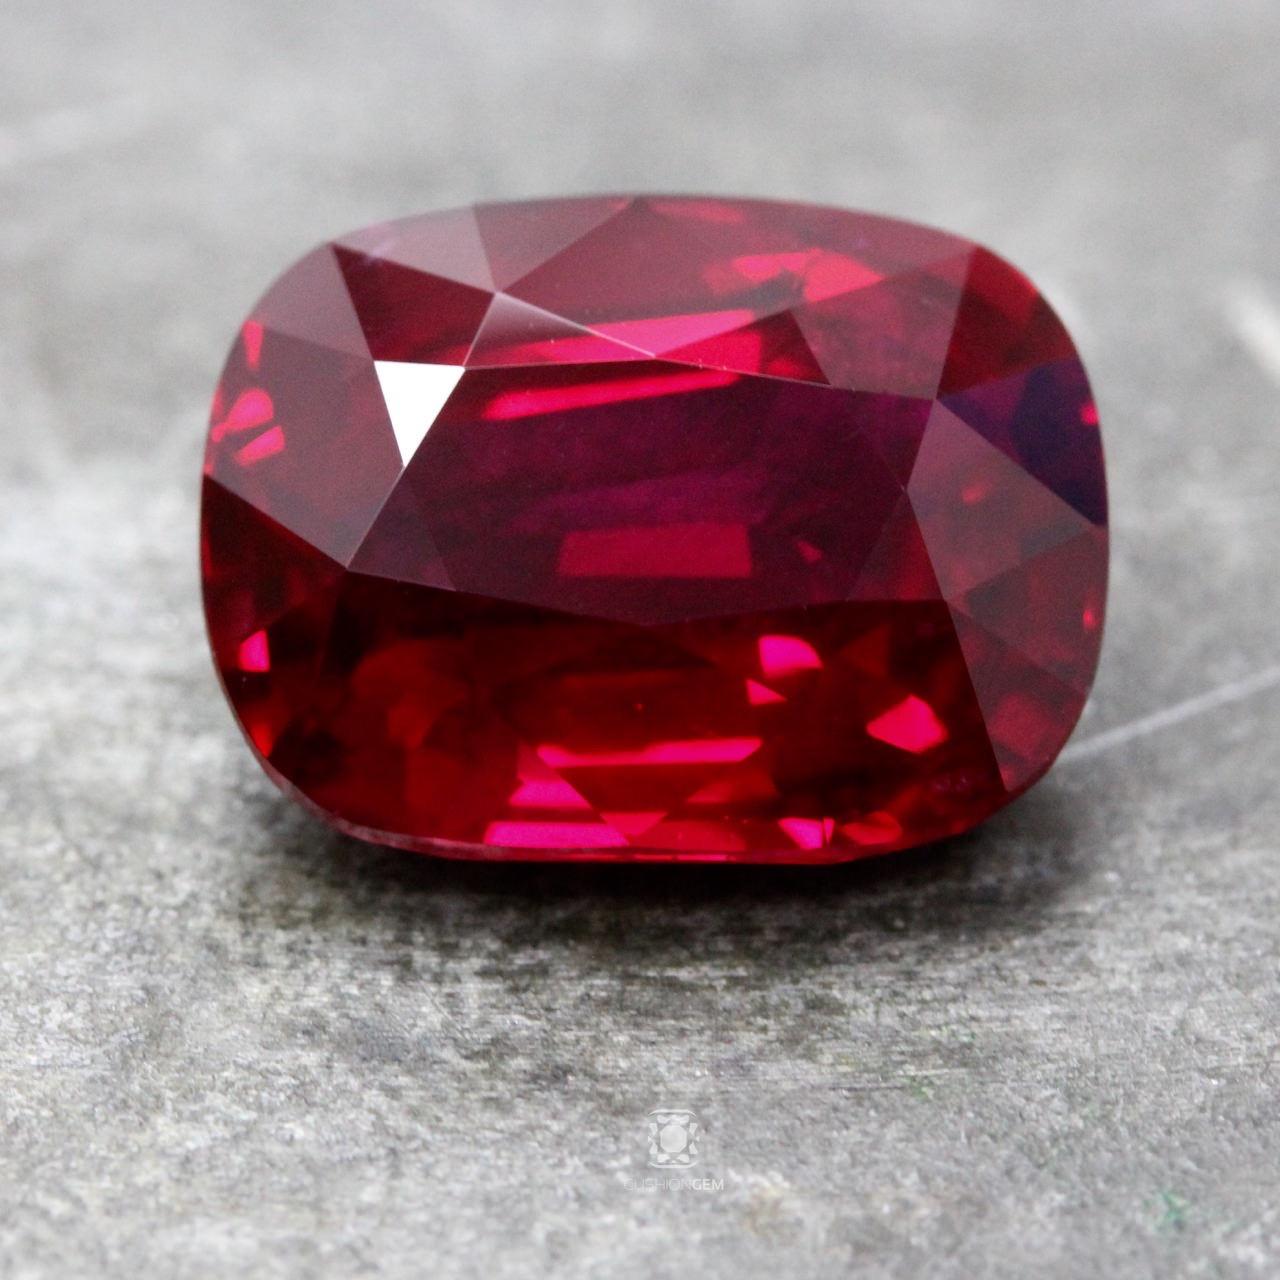 >8 carat un-heated ruby